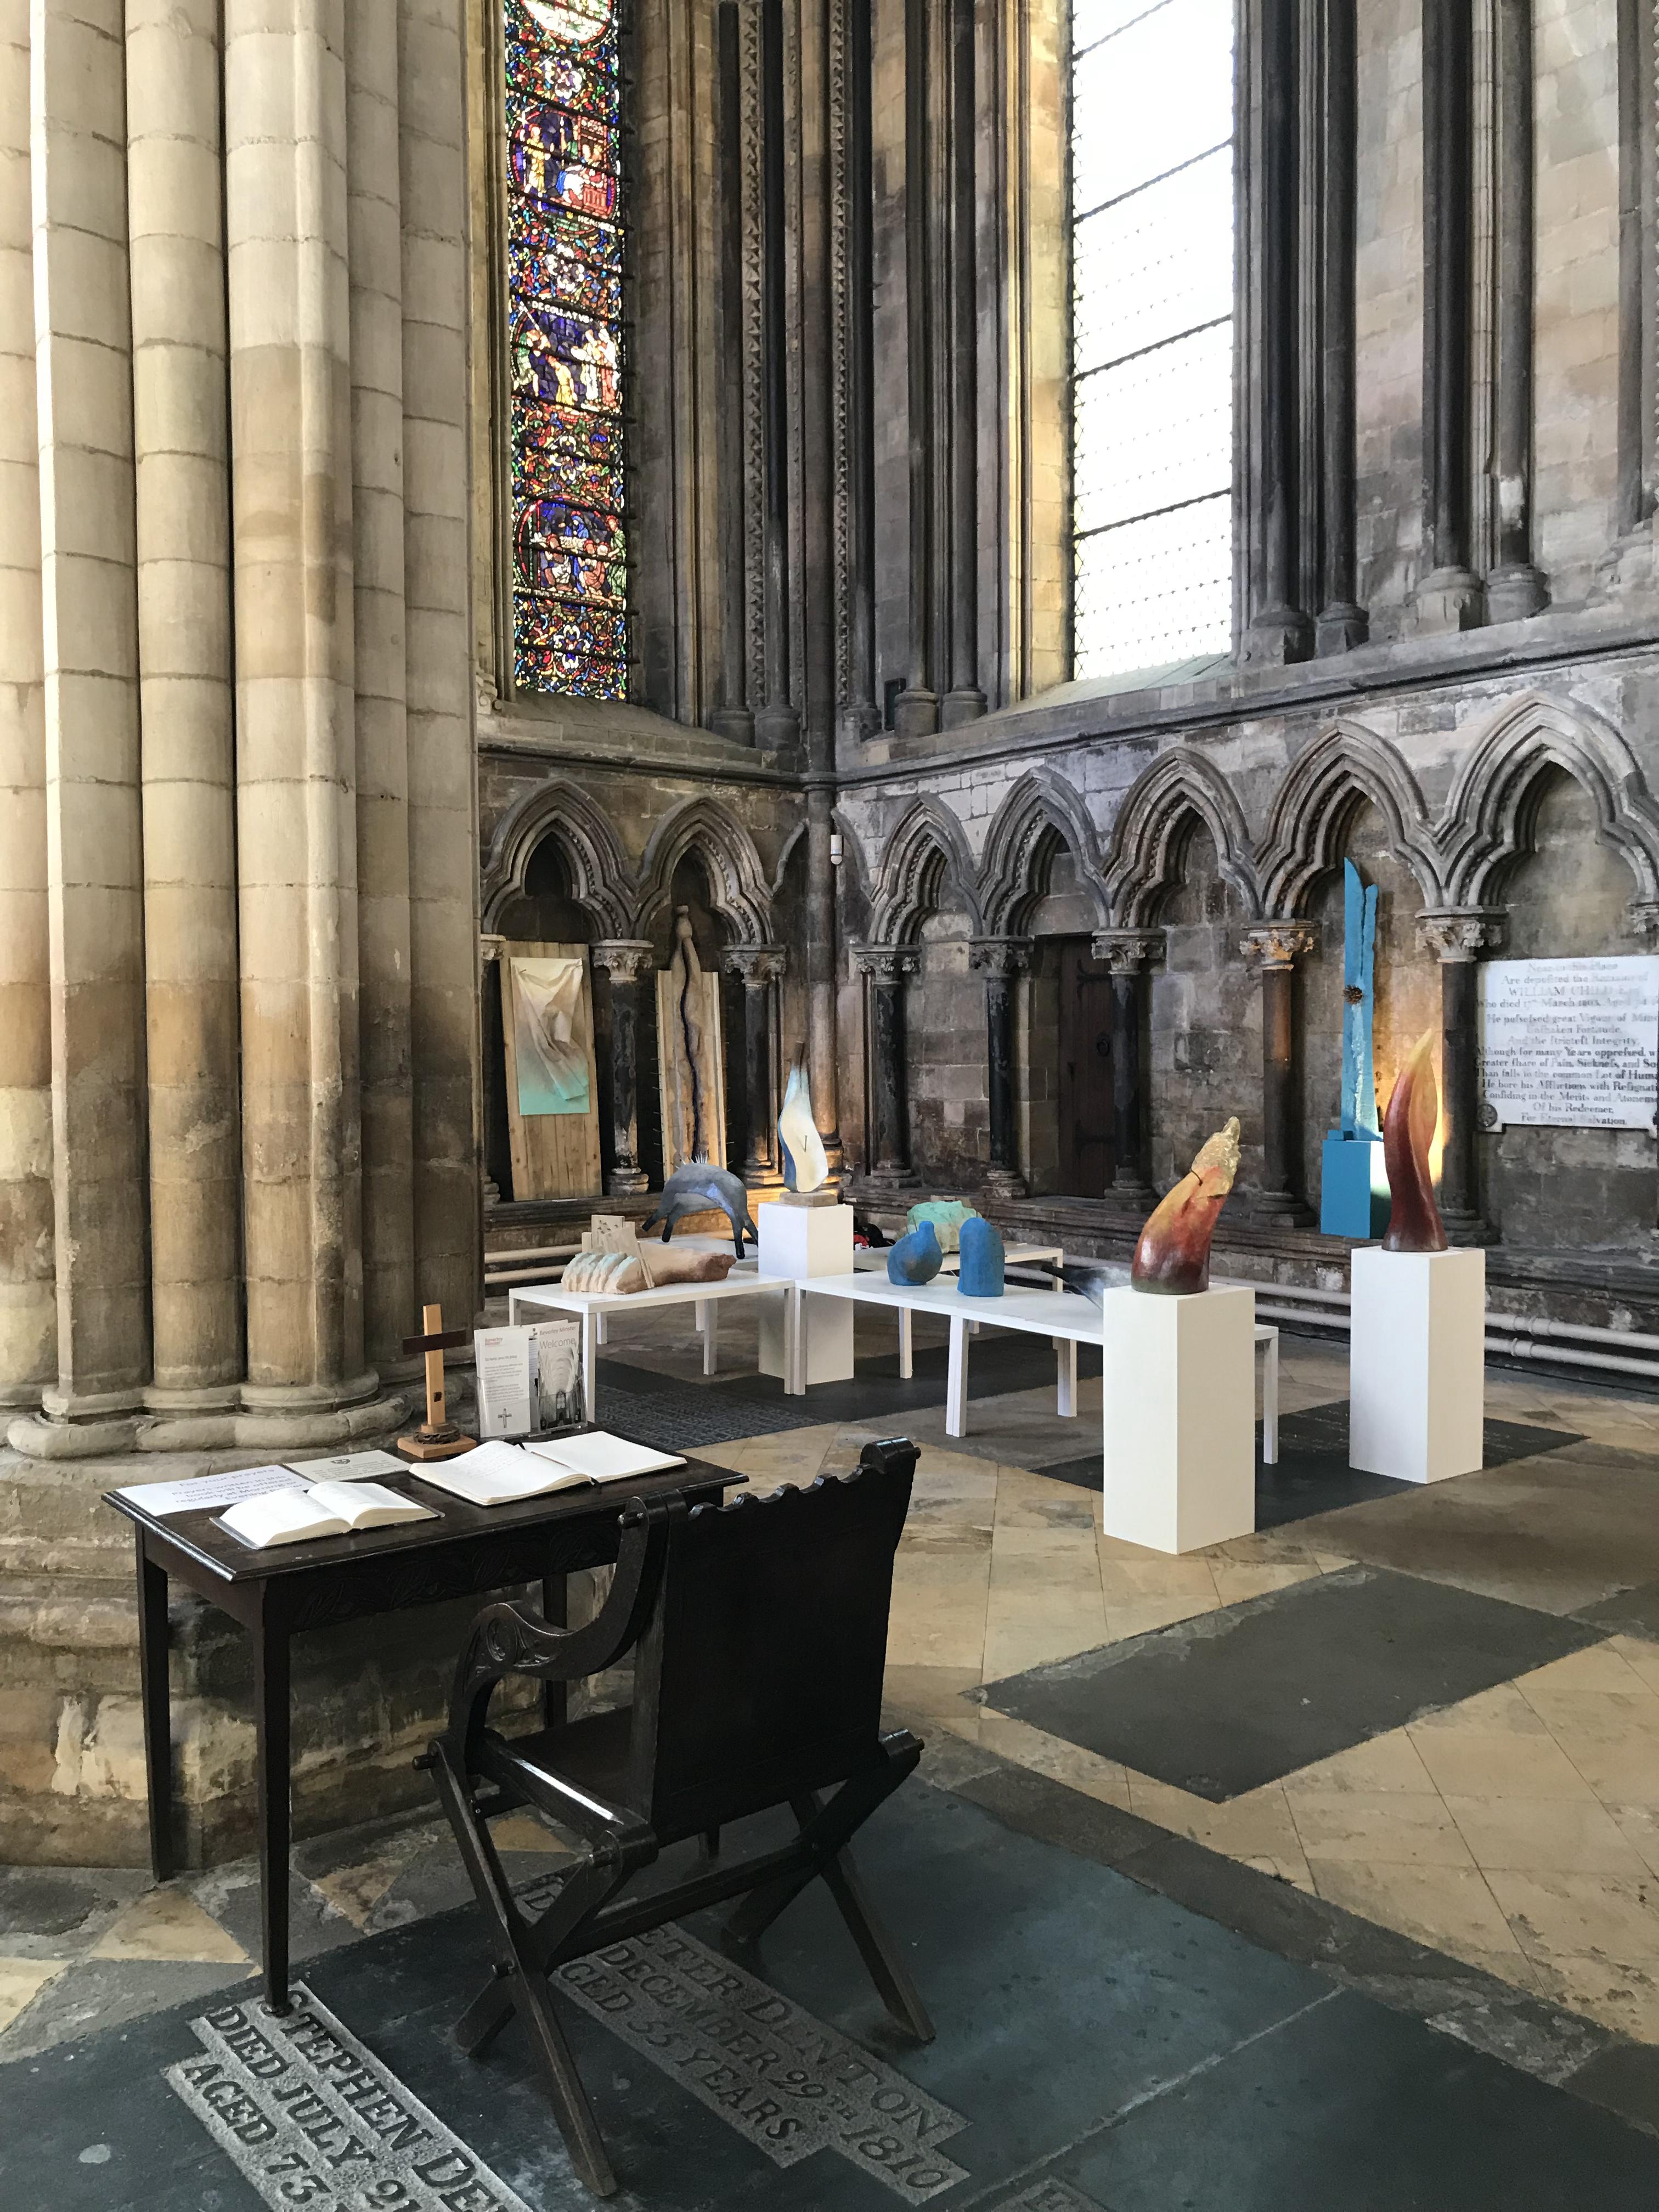 Lent installation in Beverley Minster